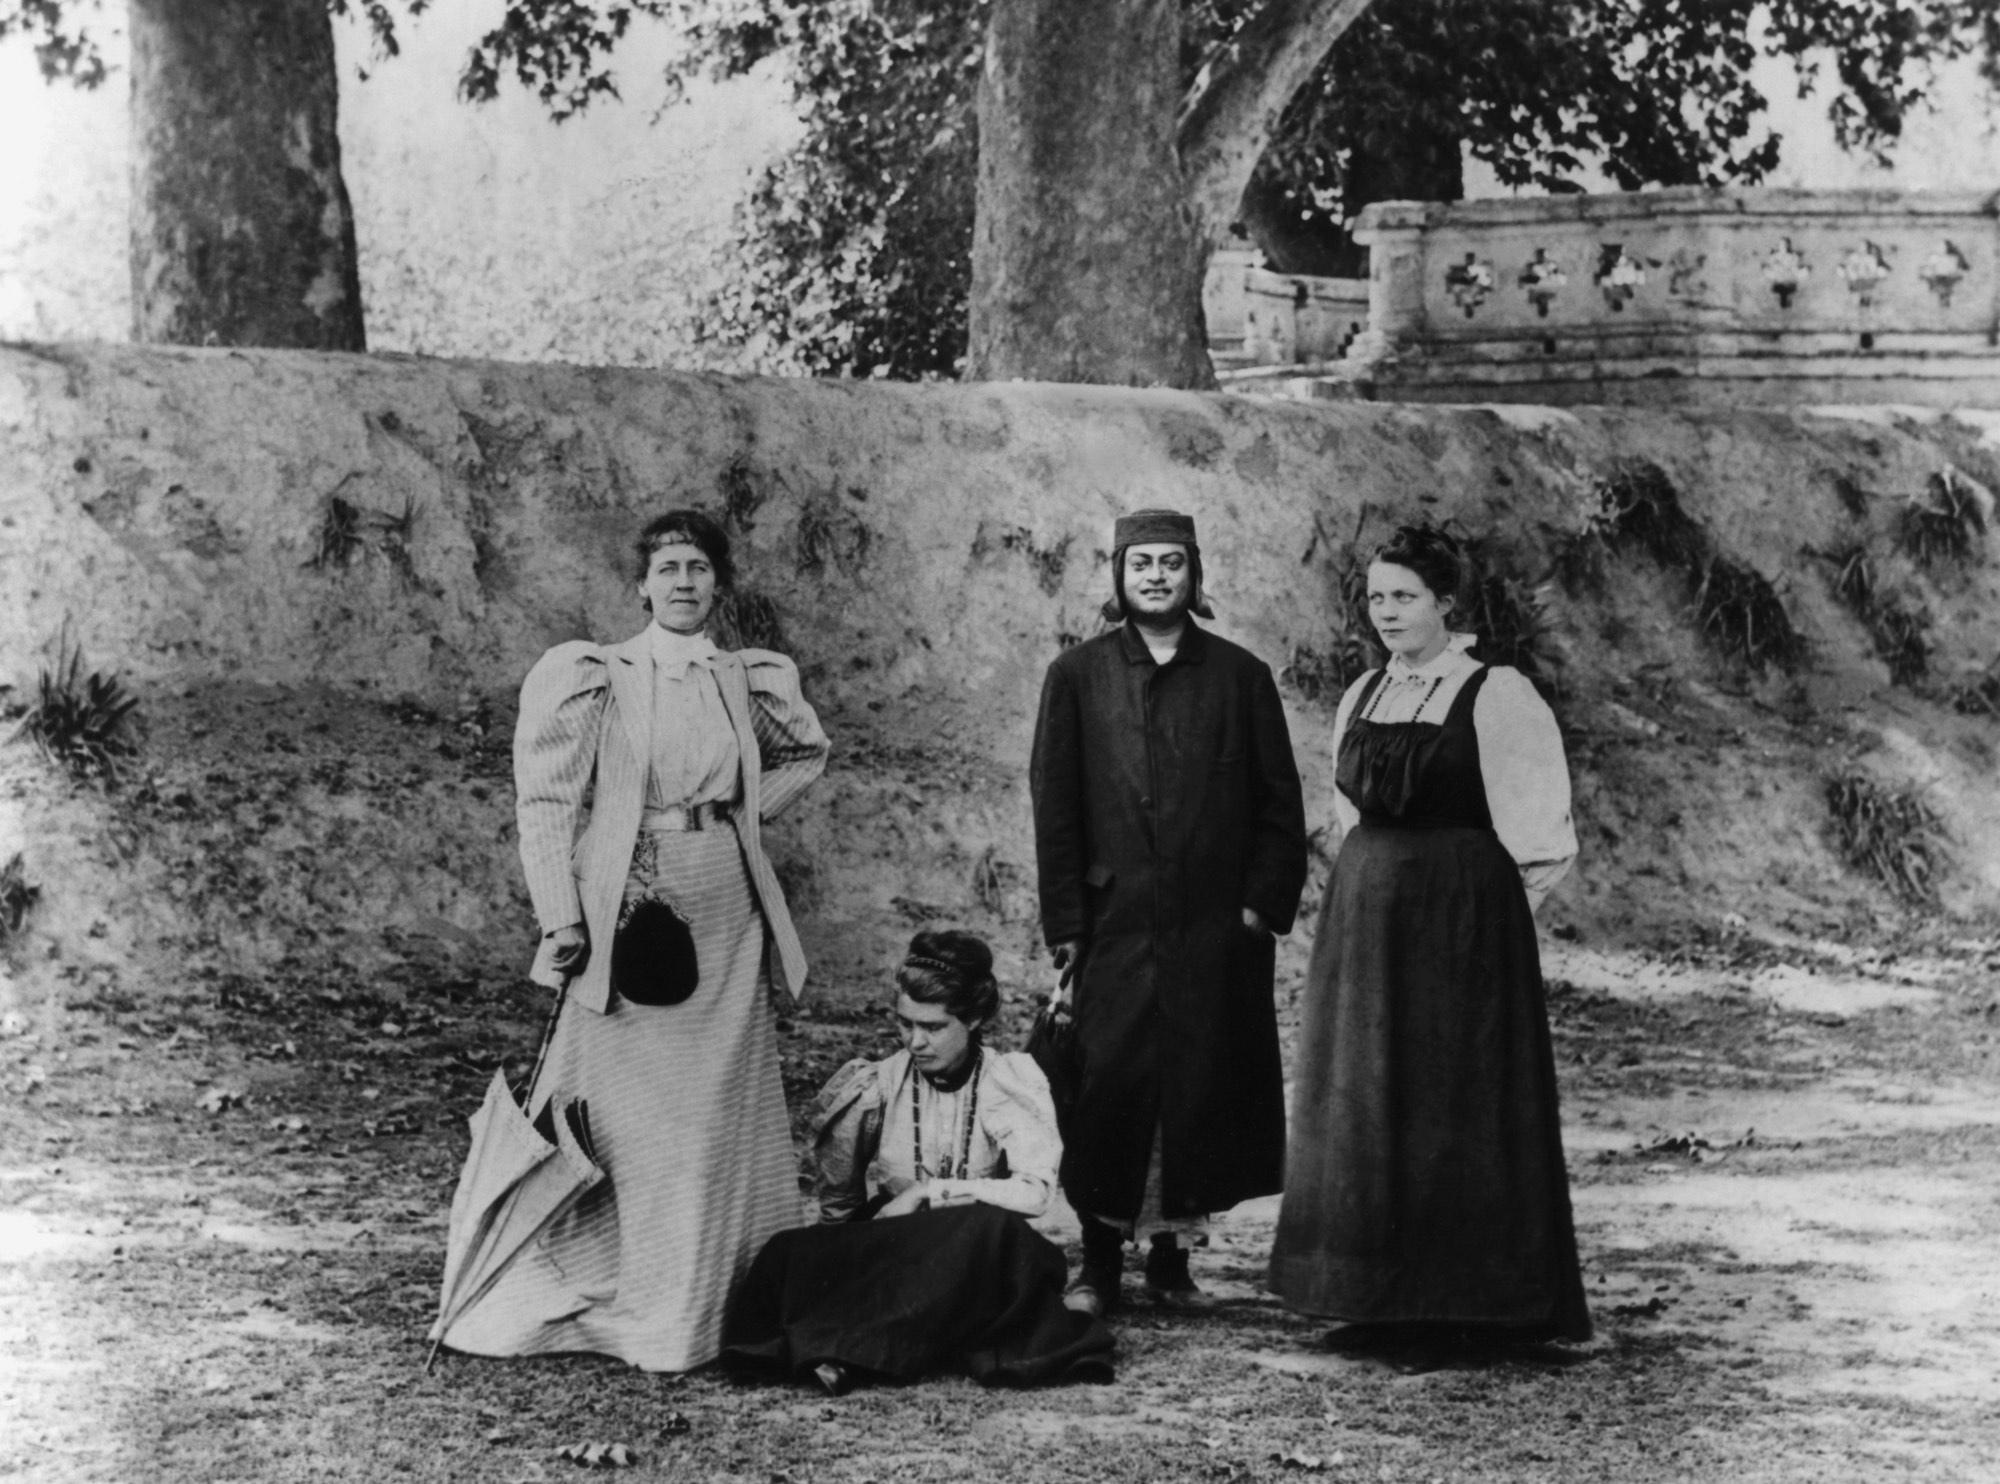 (#69) Kashmir, 1898. (From L): Josephine MacLeod, Mrs. Ole Bull, Swamiji, Sister Nivedita.